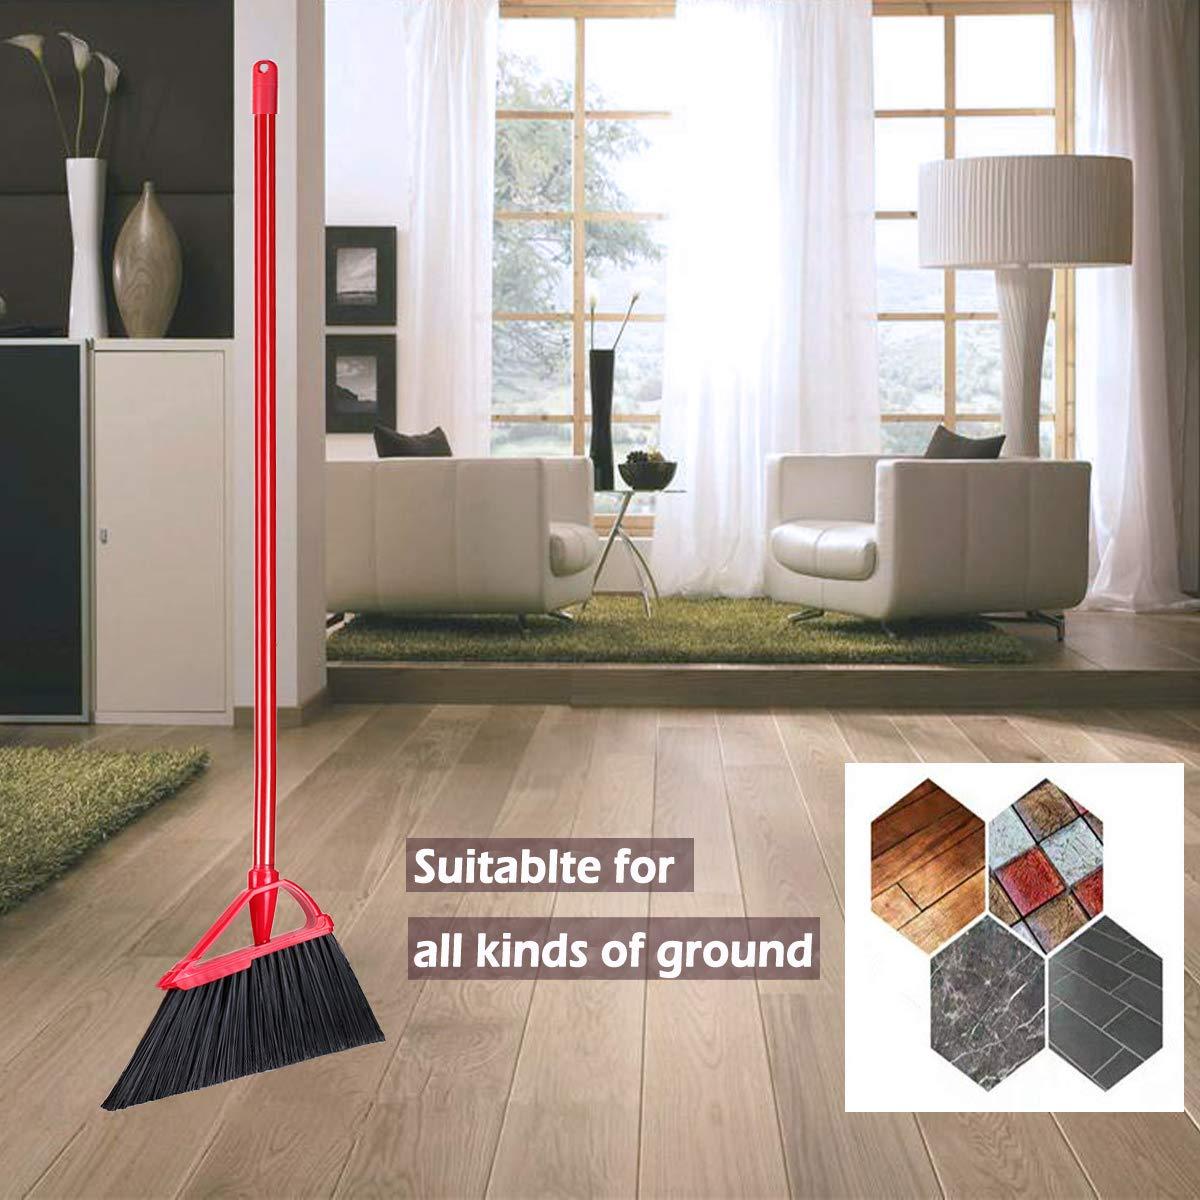 Angle Broom Dustpan Set Rubber Lip Detachable Hand Broom Indoor Outdoor Floor Sweeper Lobby Kitchen Patio Garden Garage Shop Hair Salon by Iamagie (Image #6)